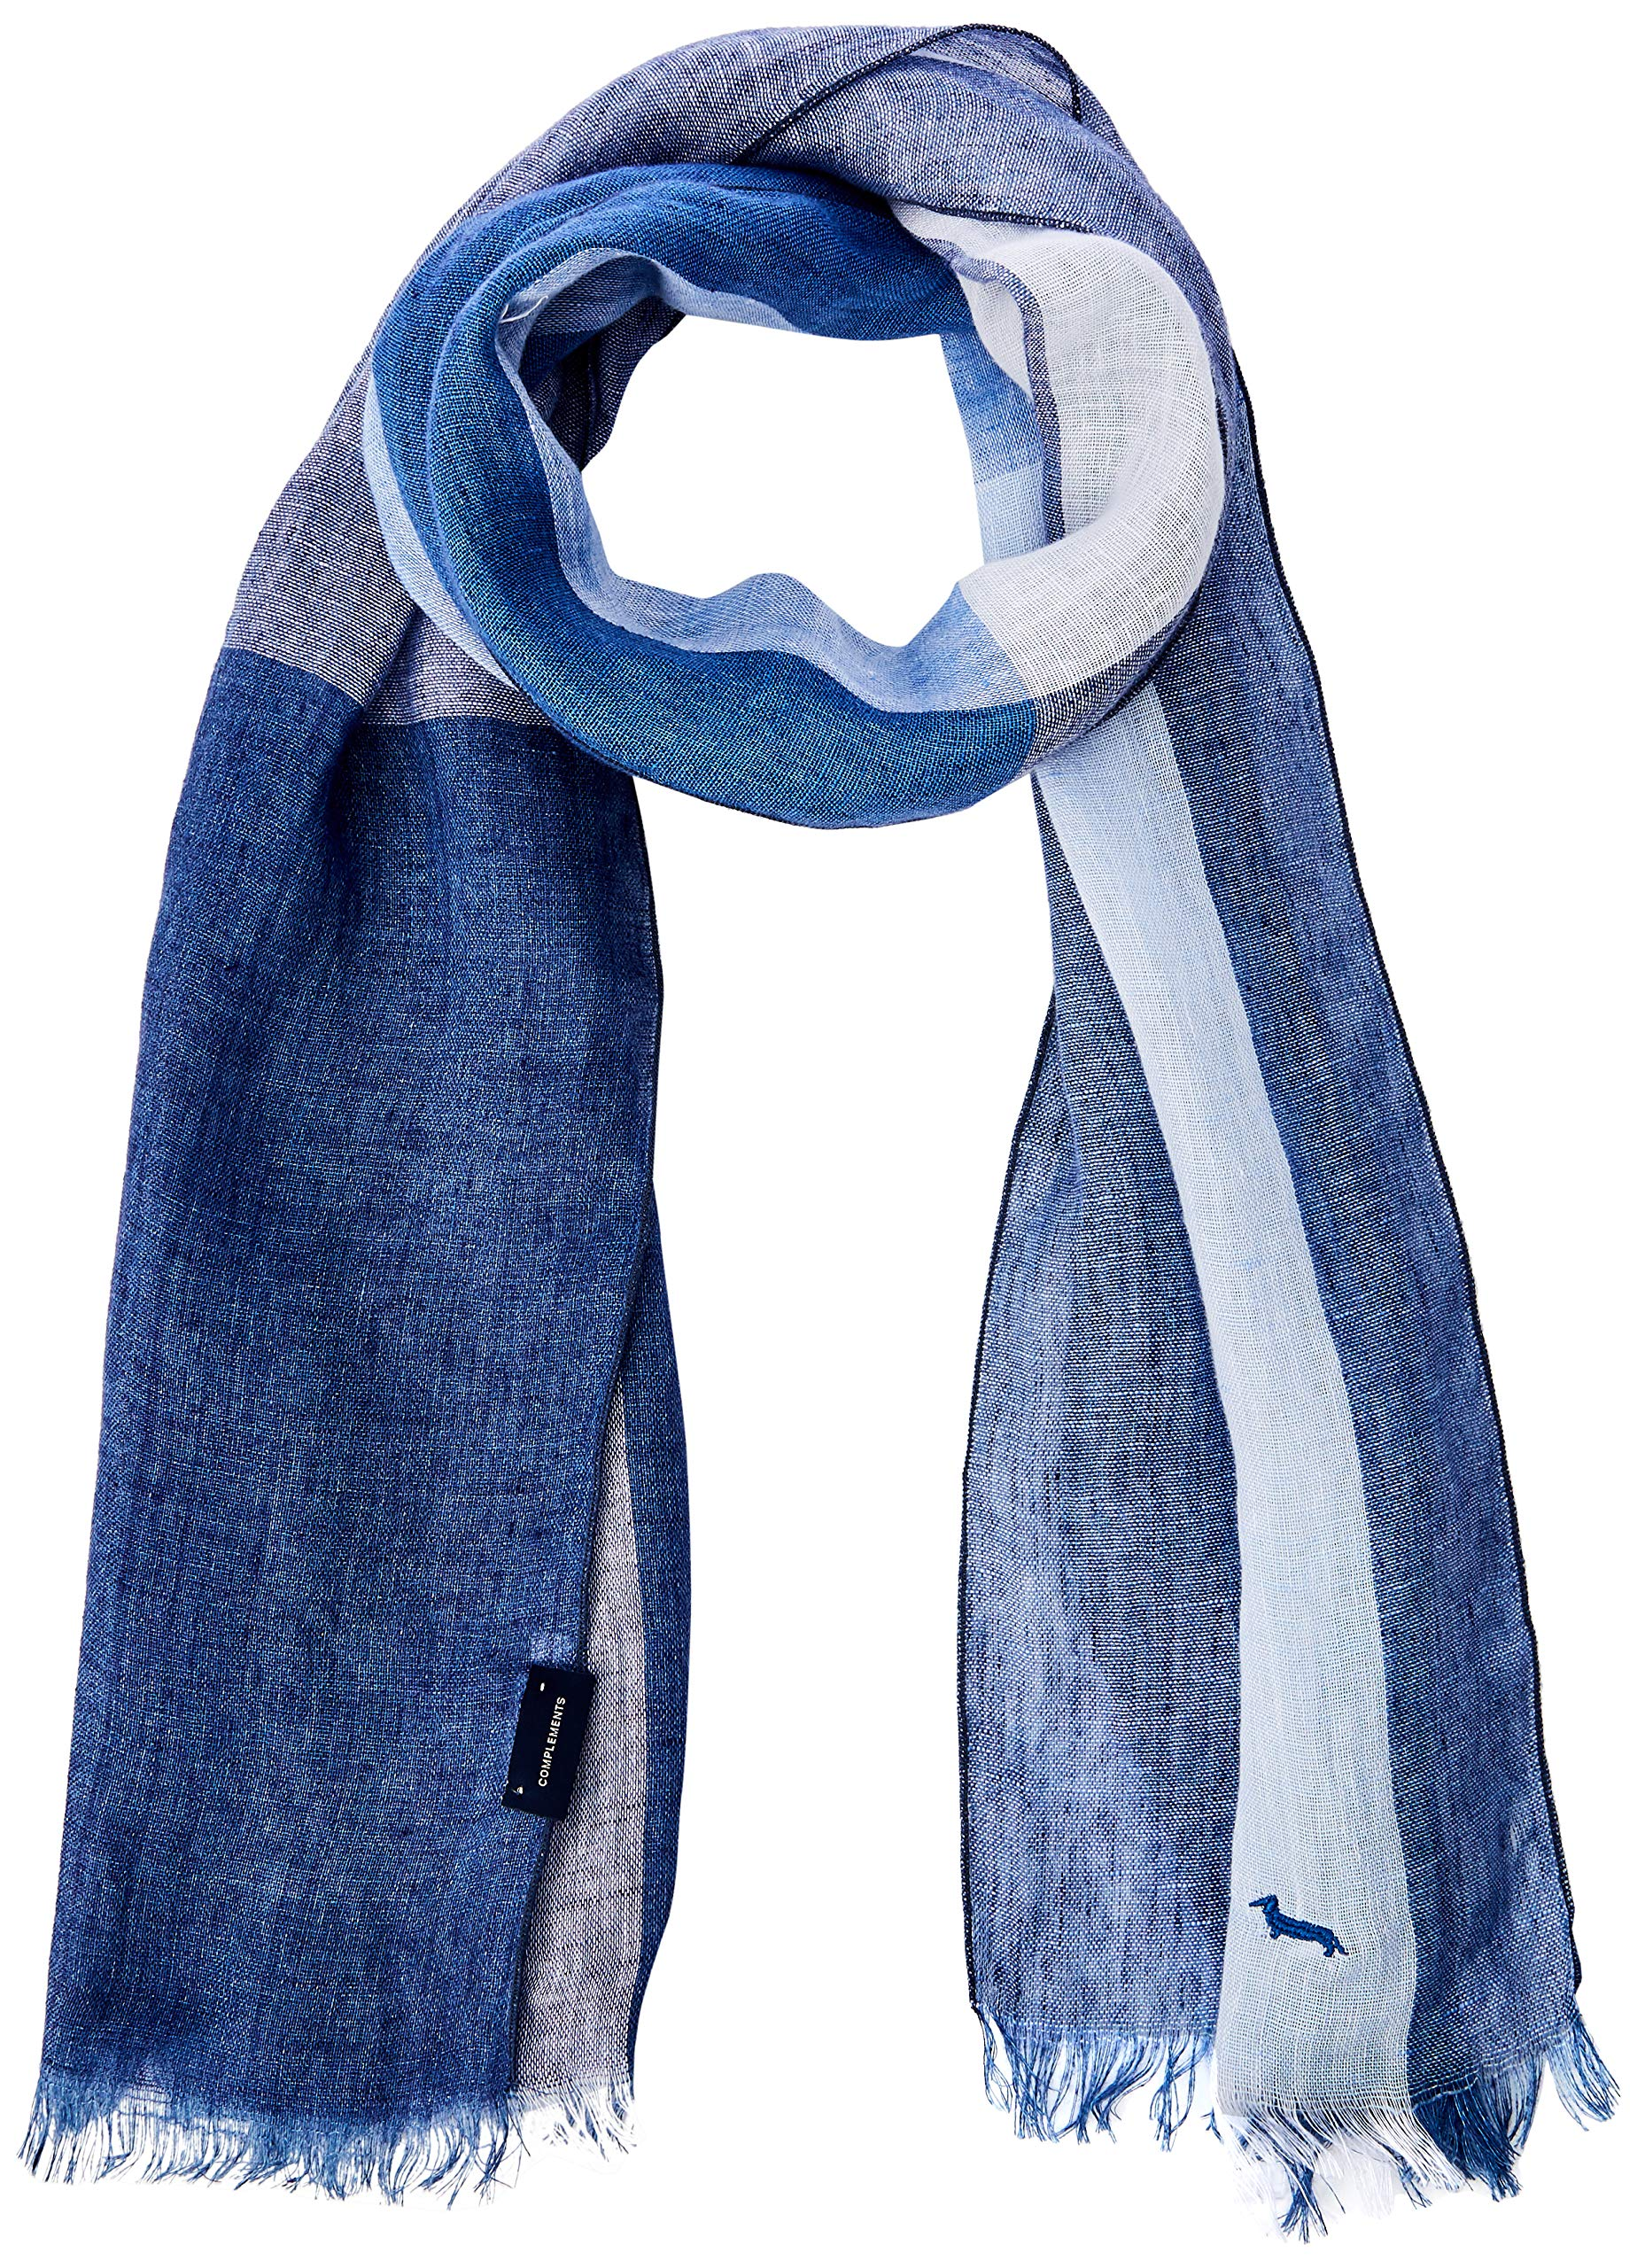 801Taille Sciarpe Blaine foulards Navy Unique Homme Blu Harmontamp; EcharpeBleu 1cKT3lFJ